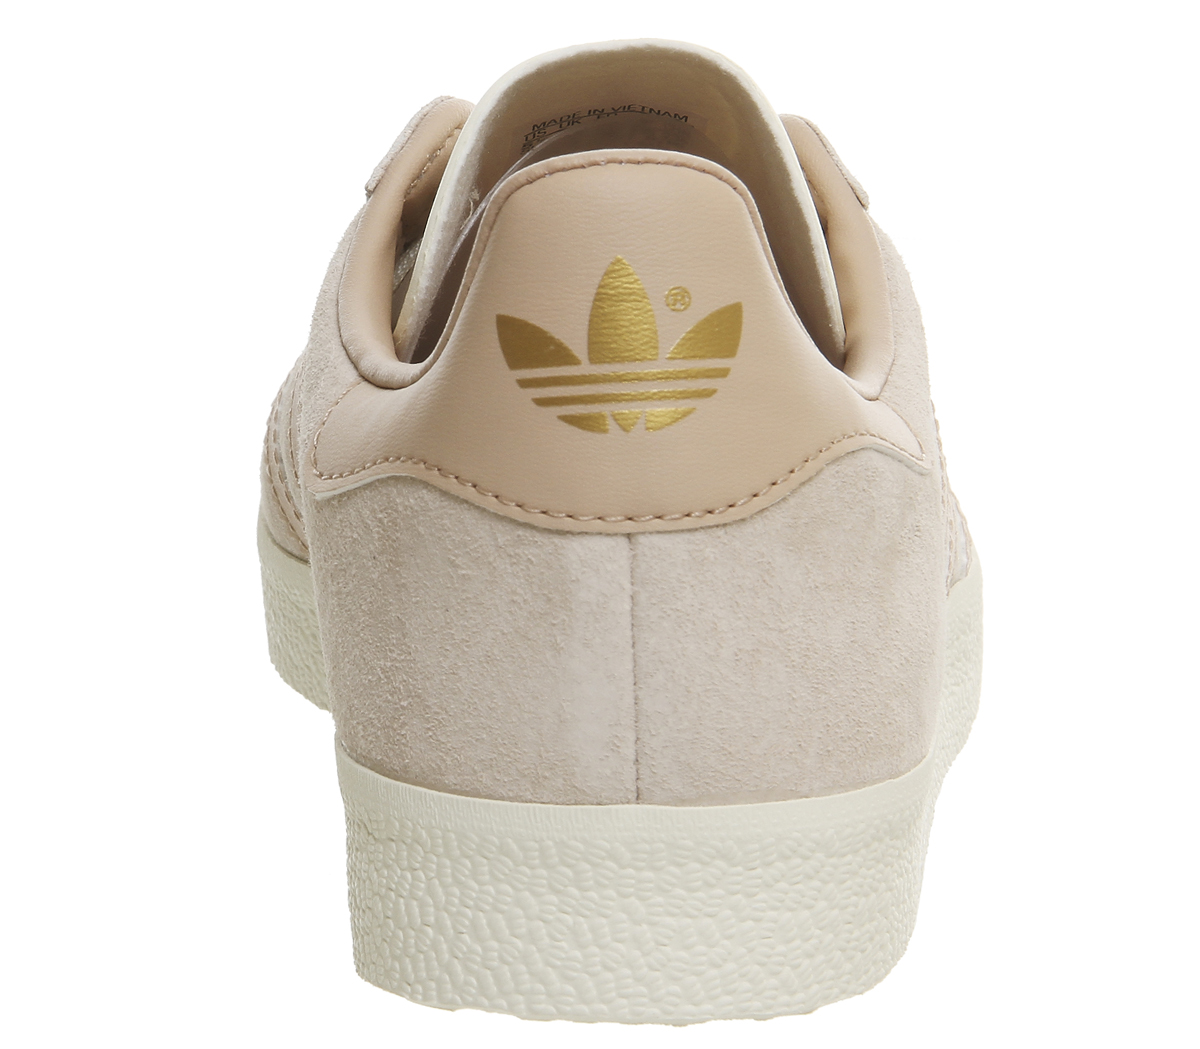 adidas gazelle trainers beige